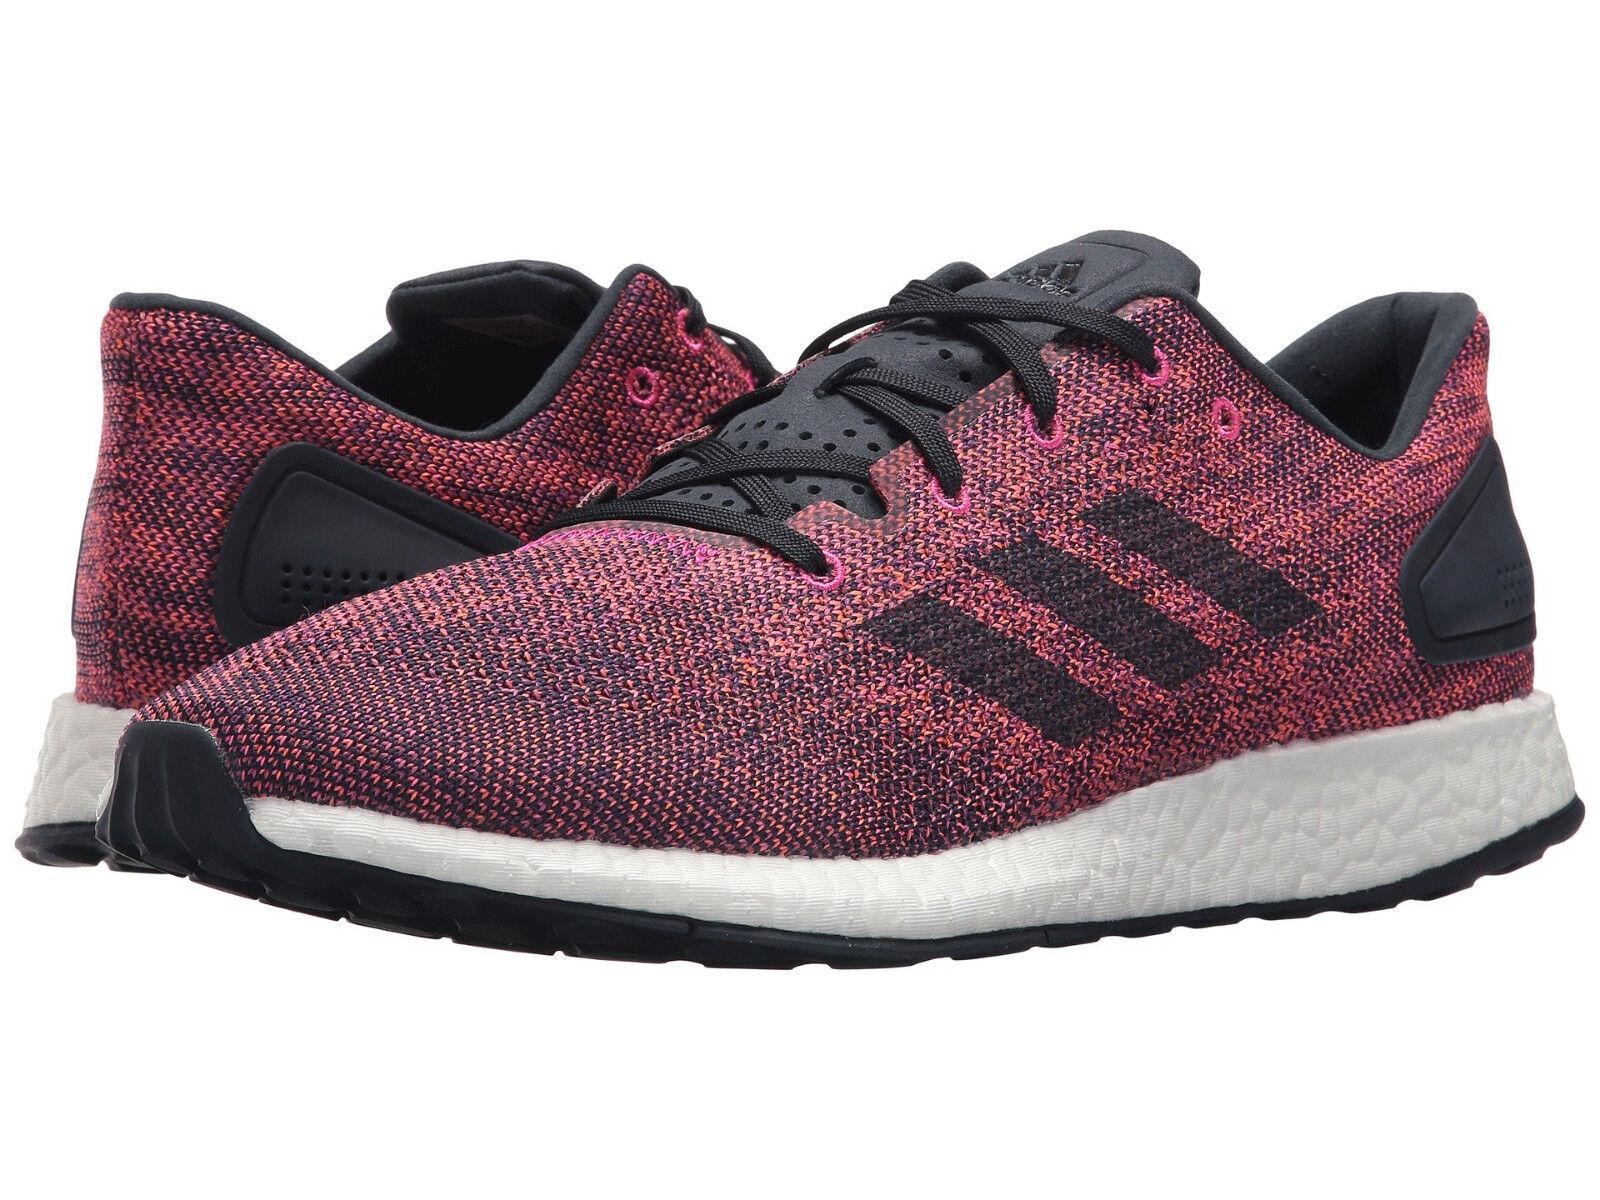 Adidas Men's PureBOOST DPR US 11.5 M Raspberry Mesh Running Sneakers Shoes $170